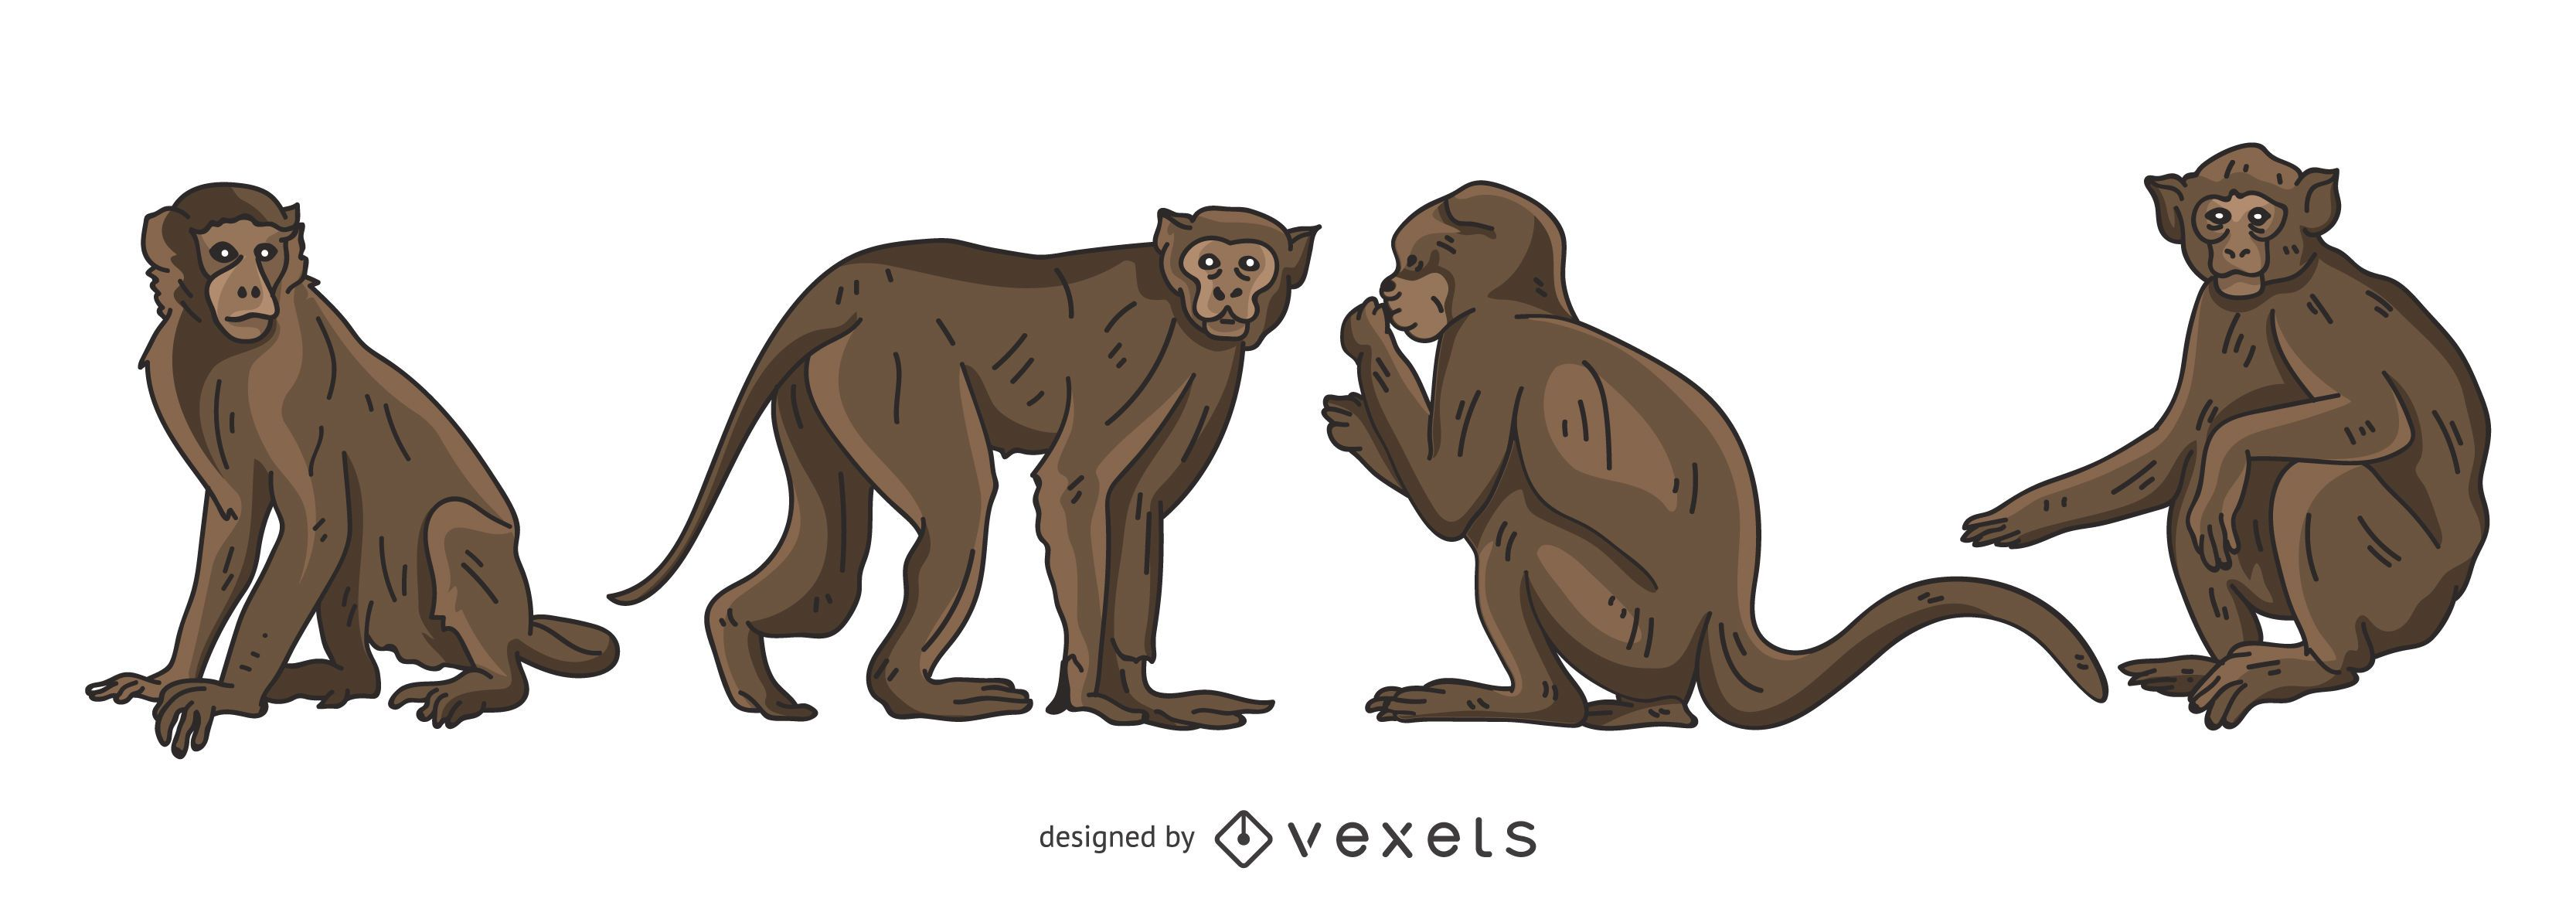 Brown Monkey Vector Set